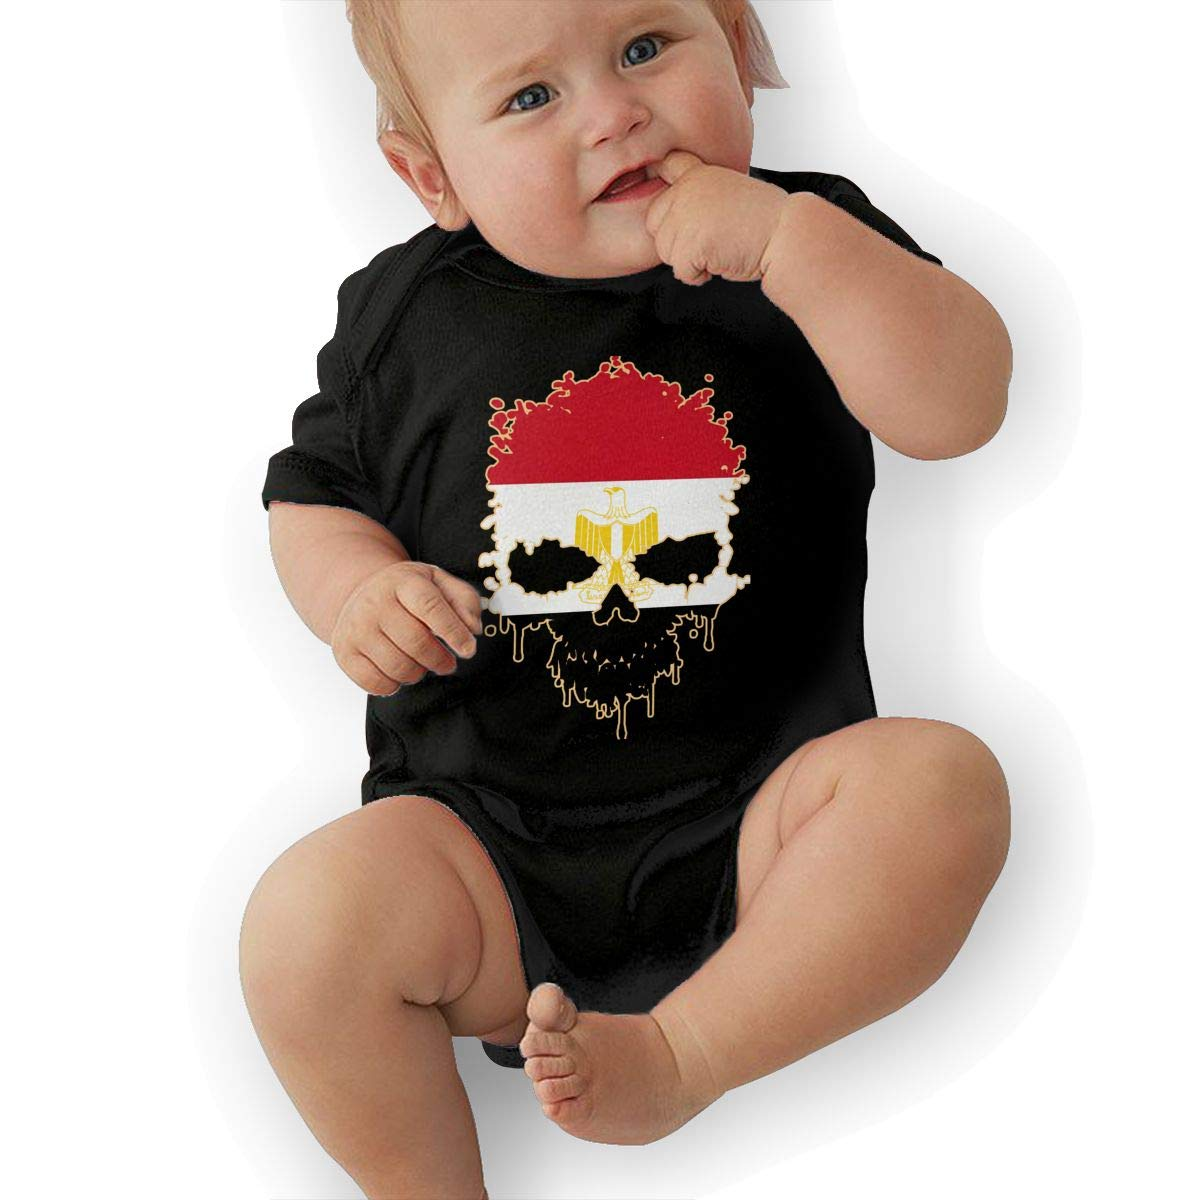 U88oi-8 Short Sleeve Cotton Rompers for Baby Girls Boys Soft Egypt Skull Sleepwear